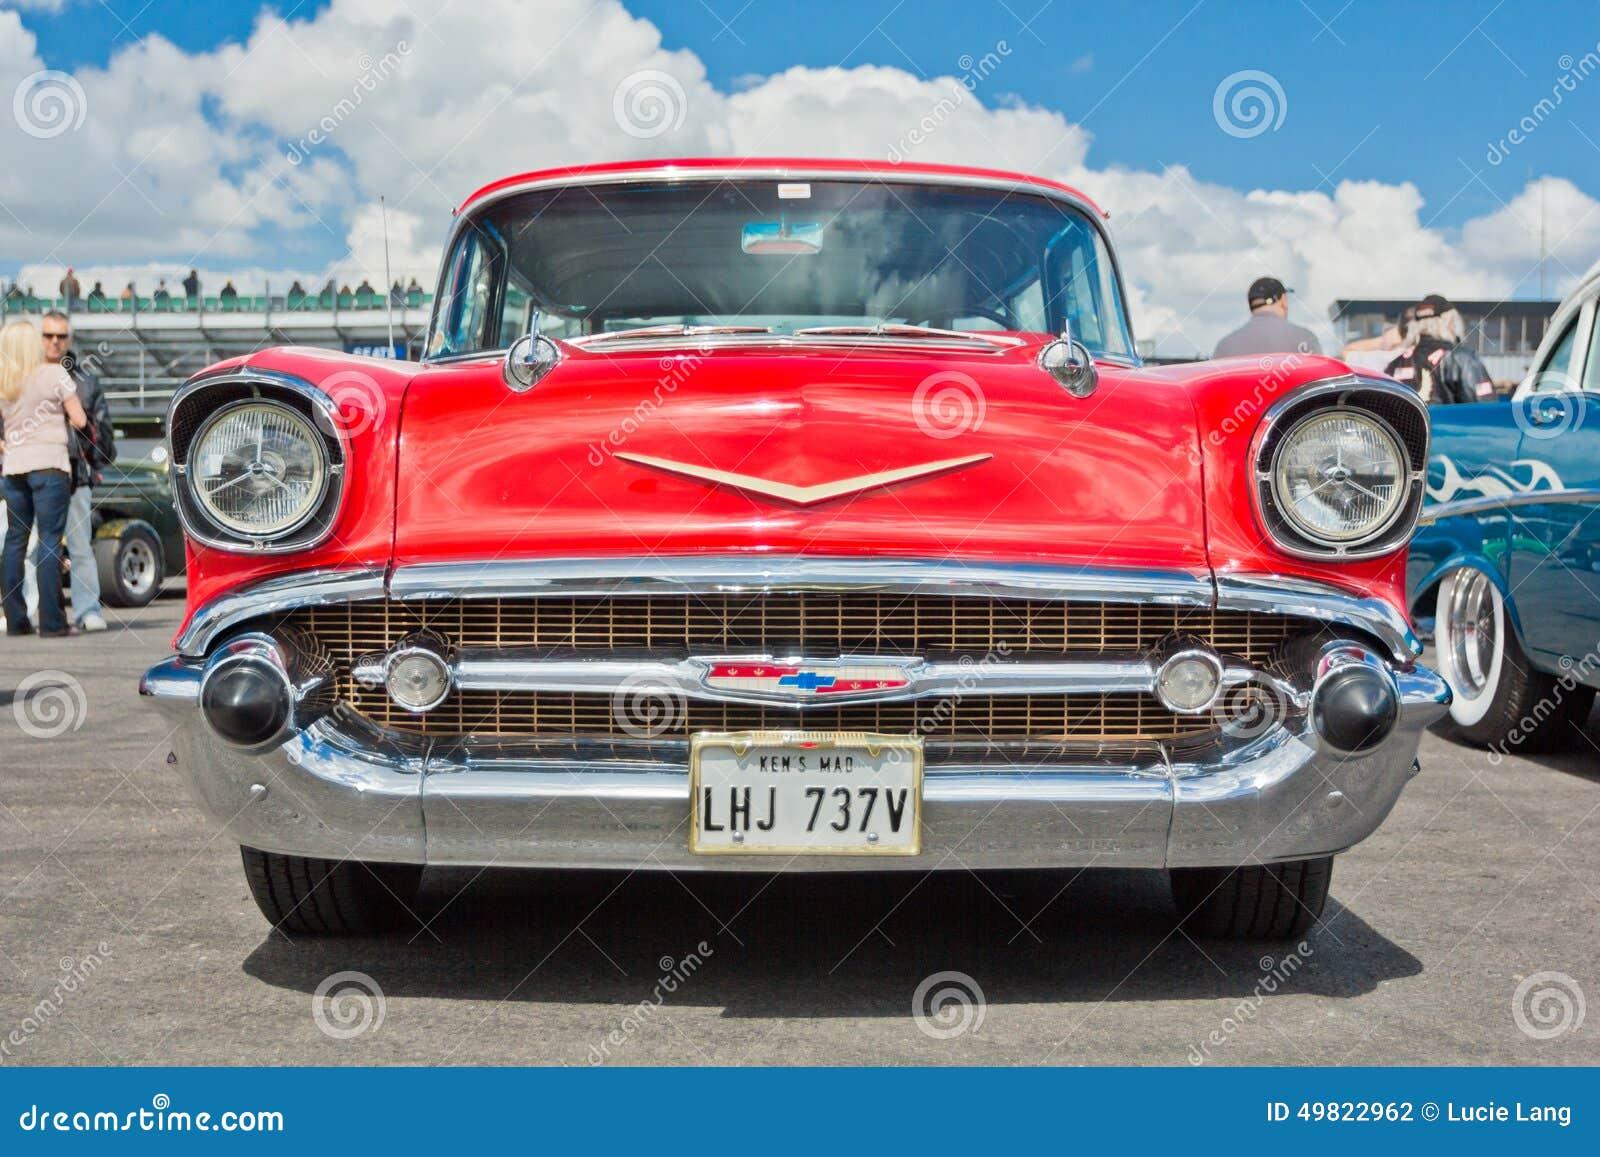 Image Result For American Chevroleta